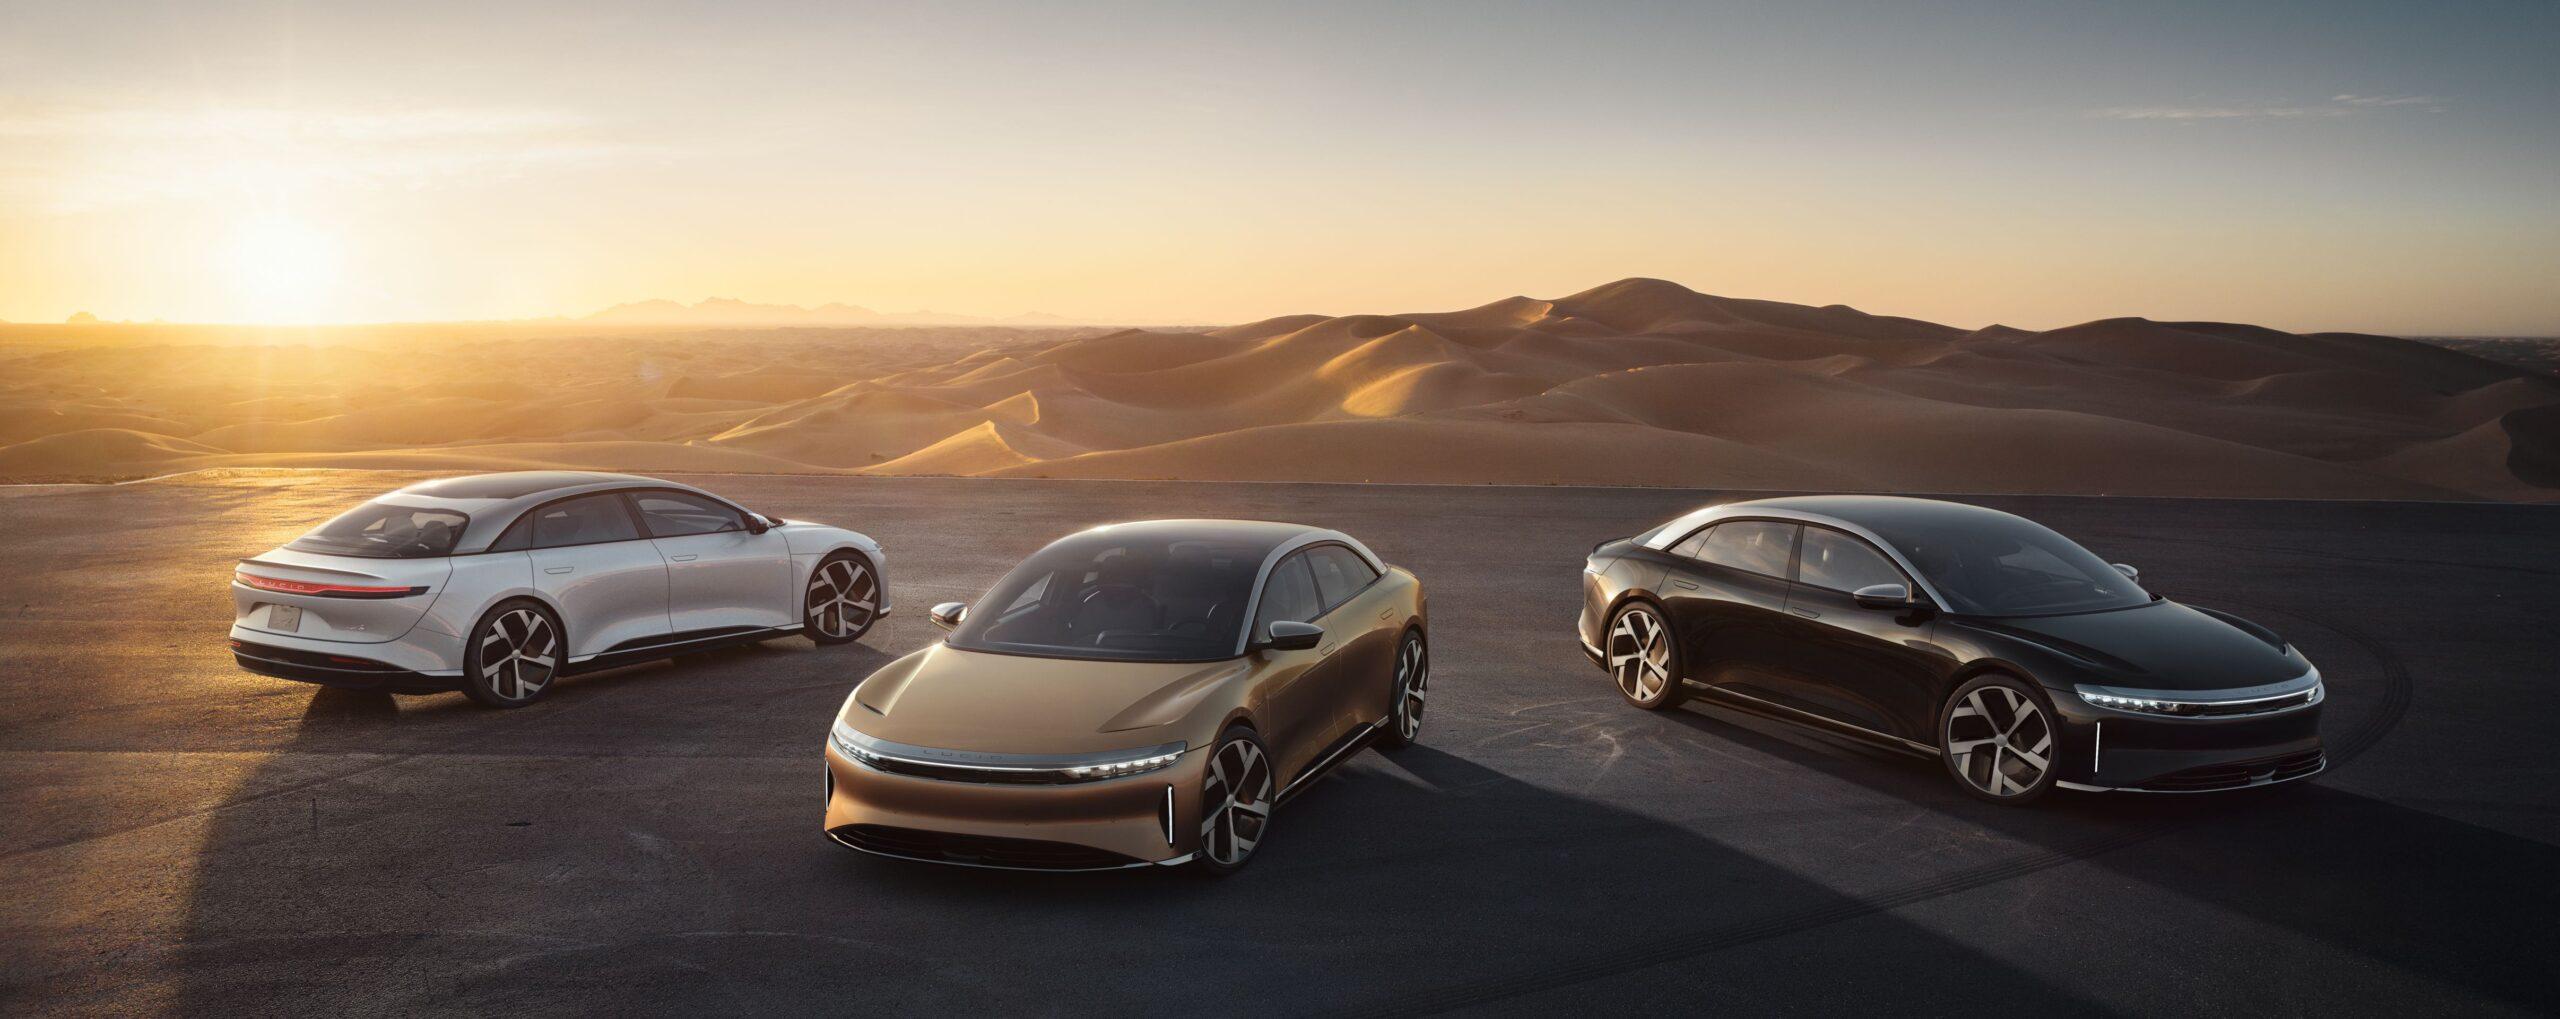 "Lucid Motors: Building A ""No Compromise"" Brand (CleanTechnica)"